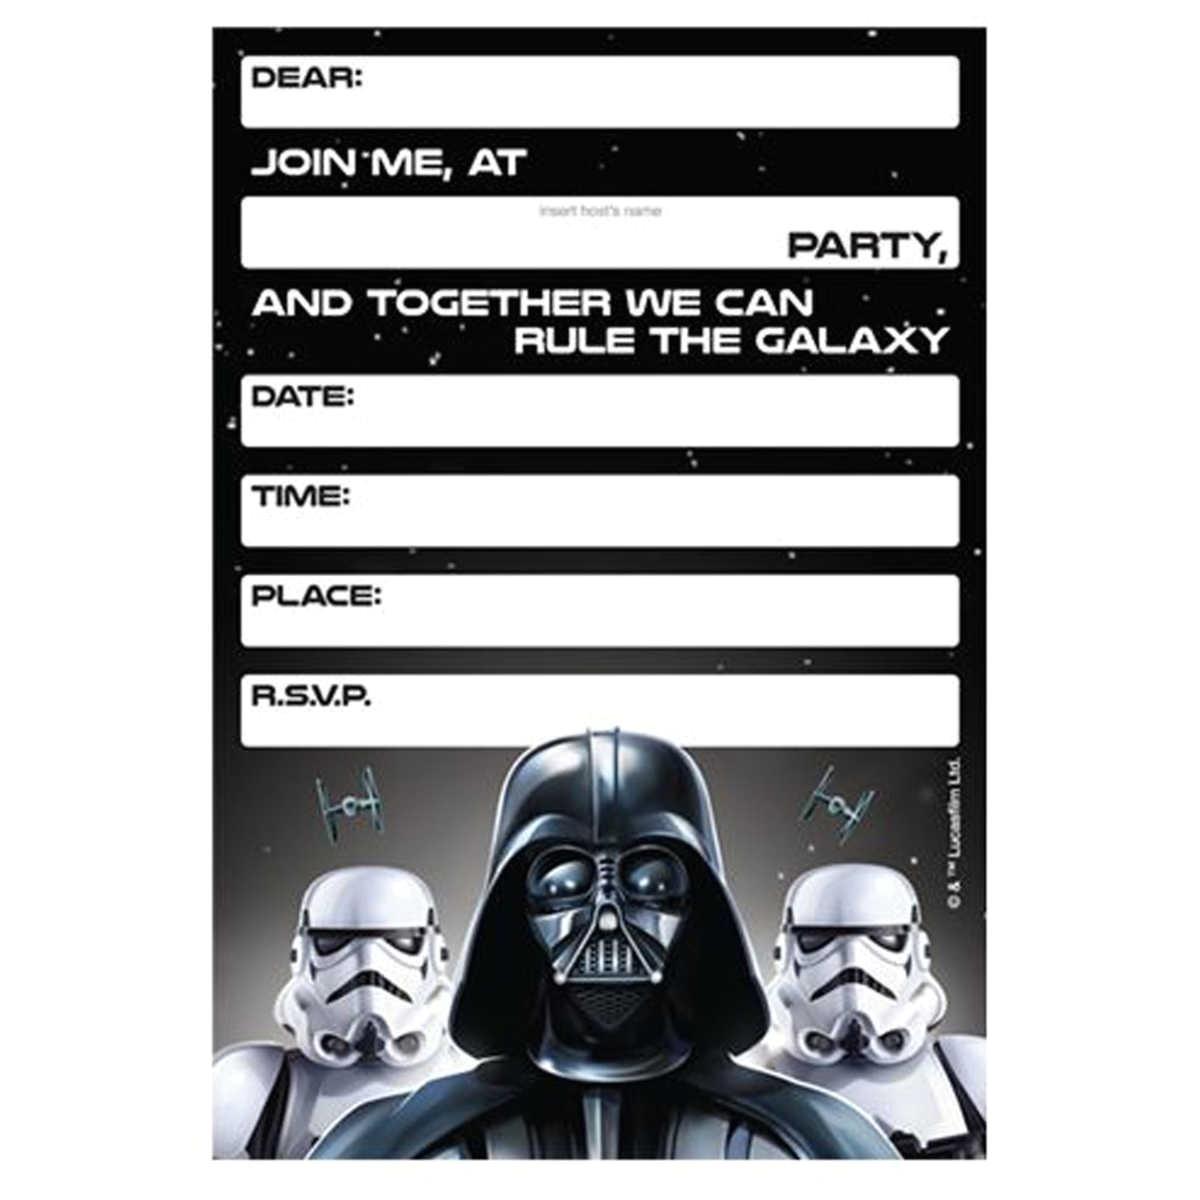 Star Wars Birthday Invitation Template Lego Star Wars Birthday Invitations Template Bagvania